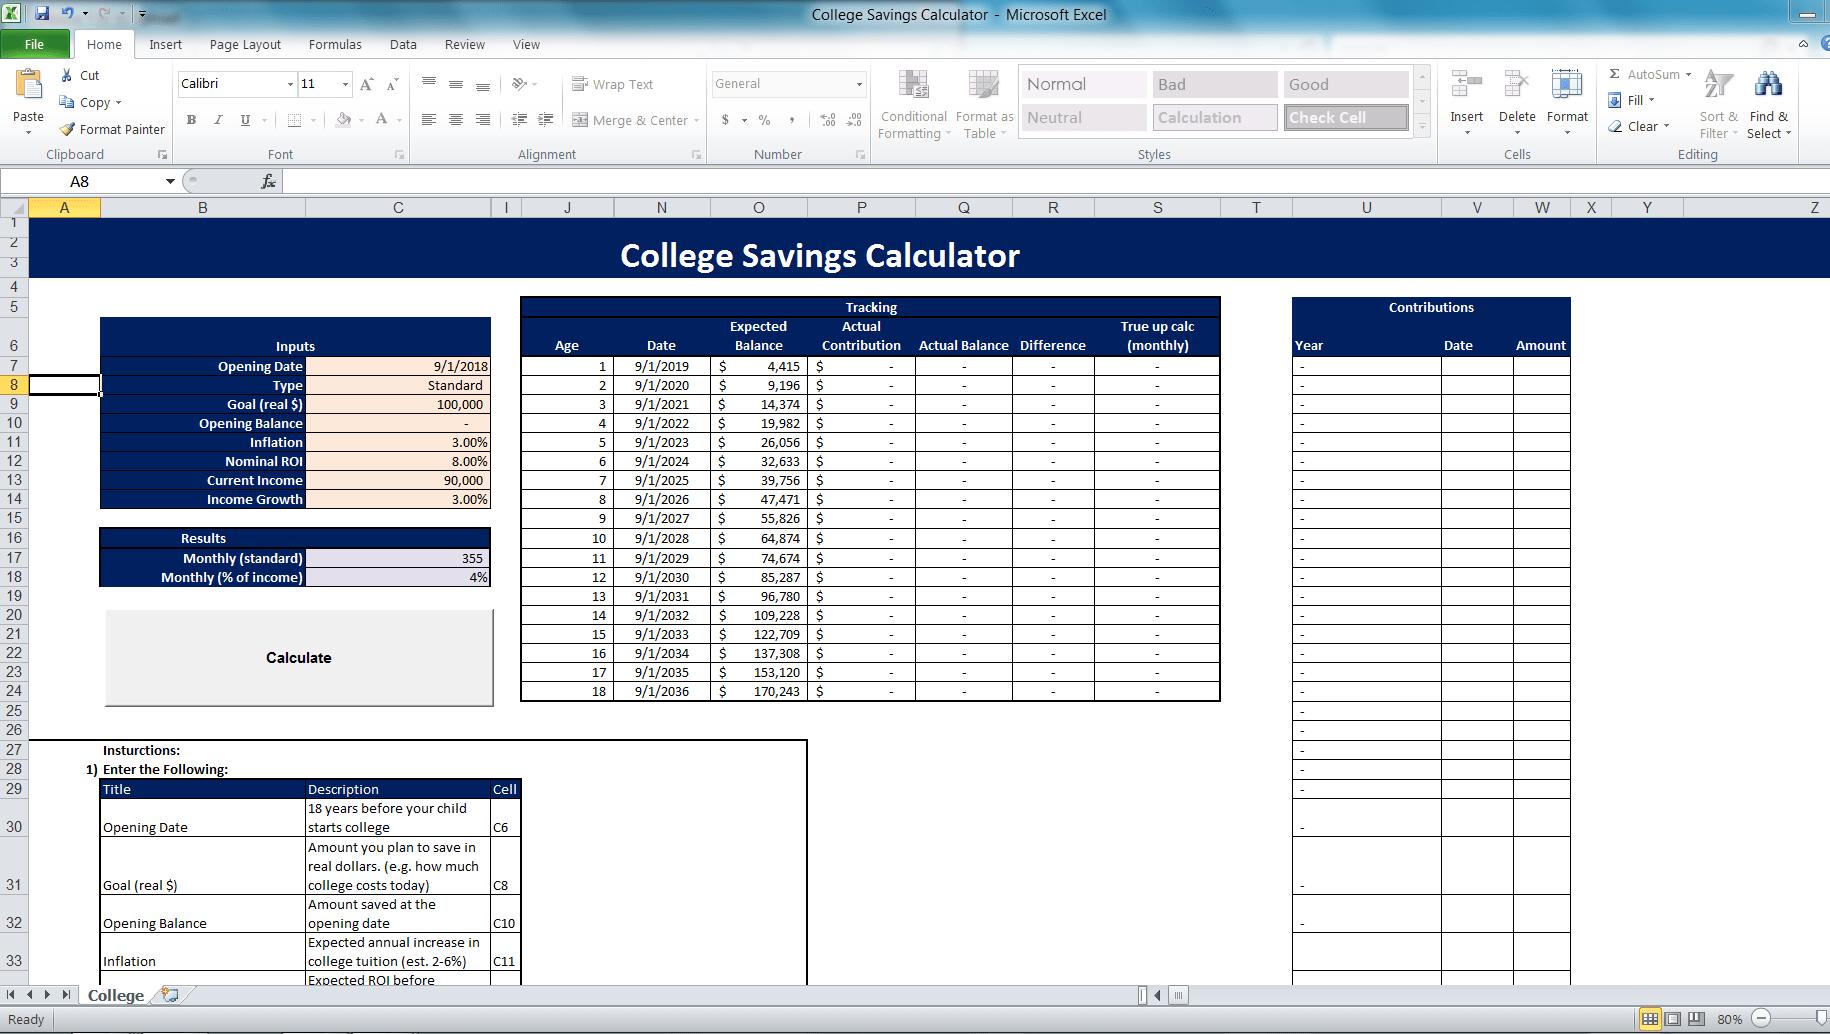 College Savings Calculator